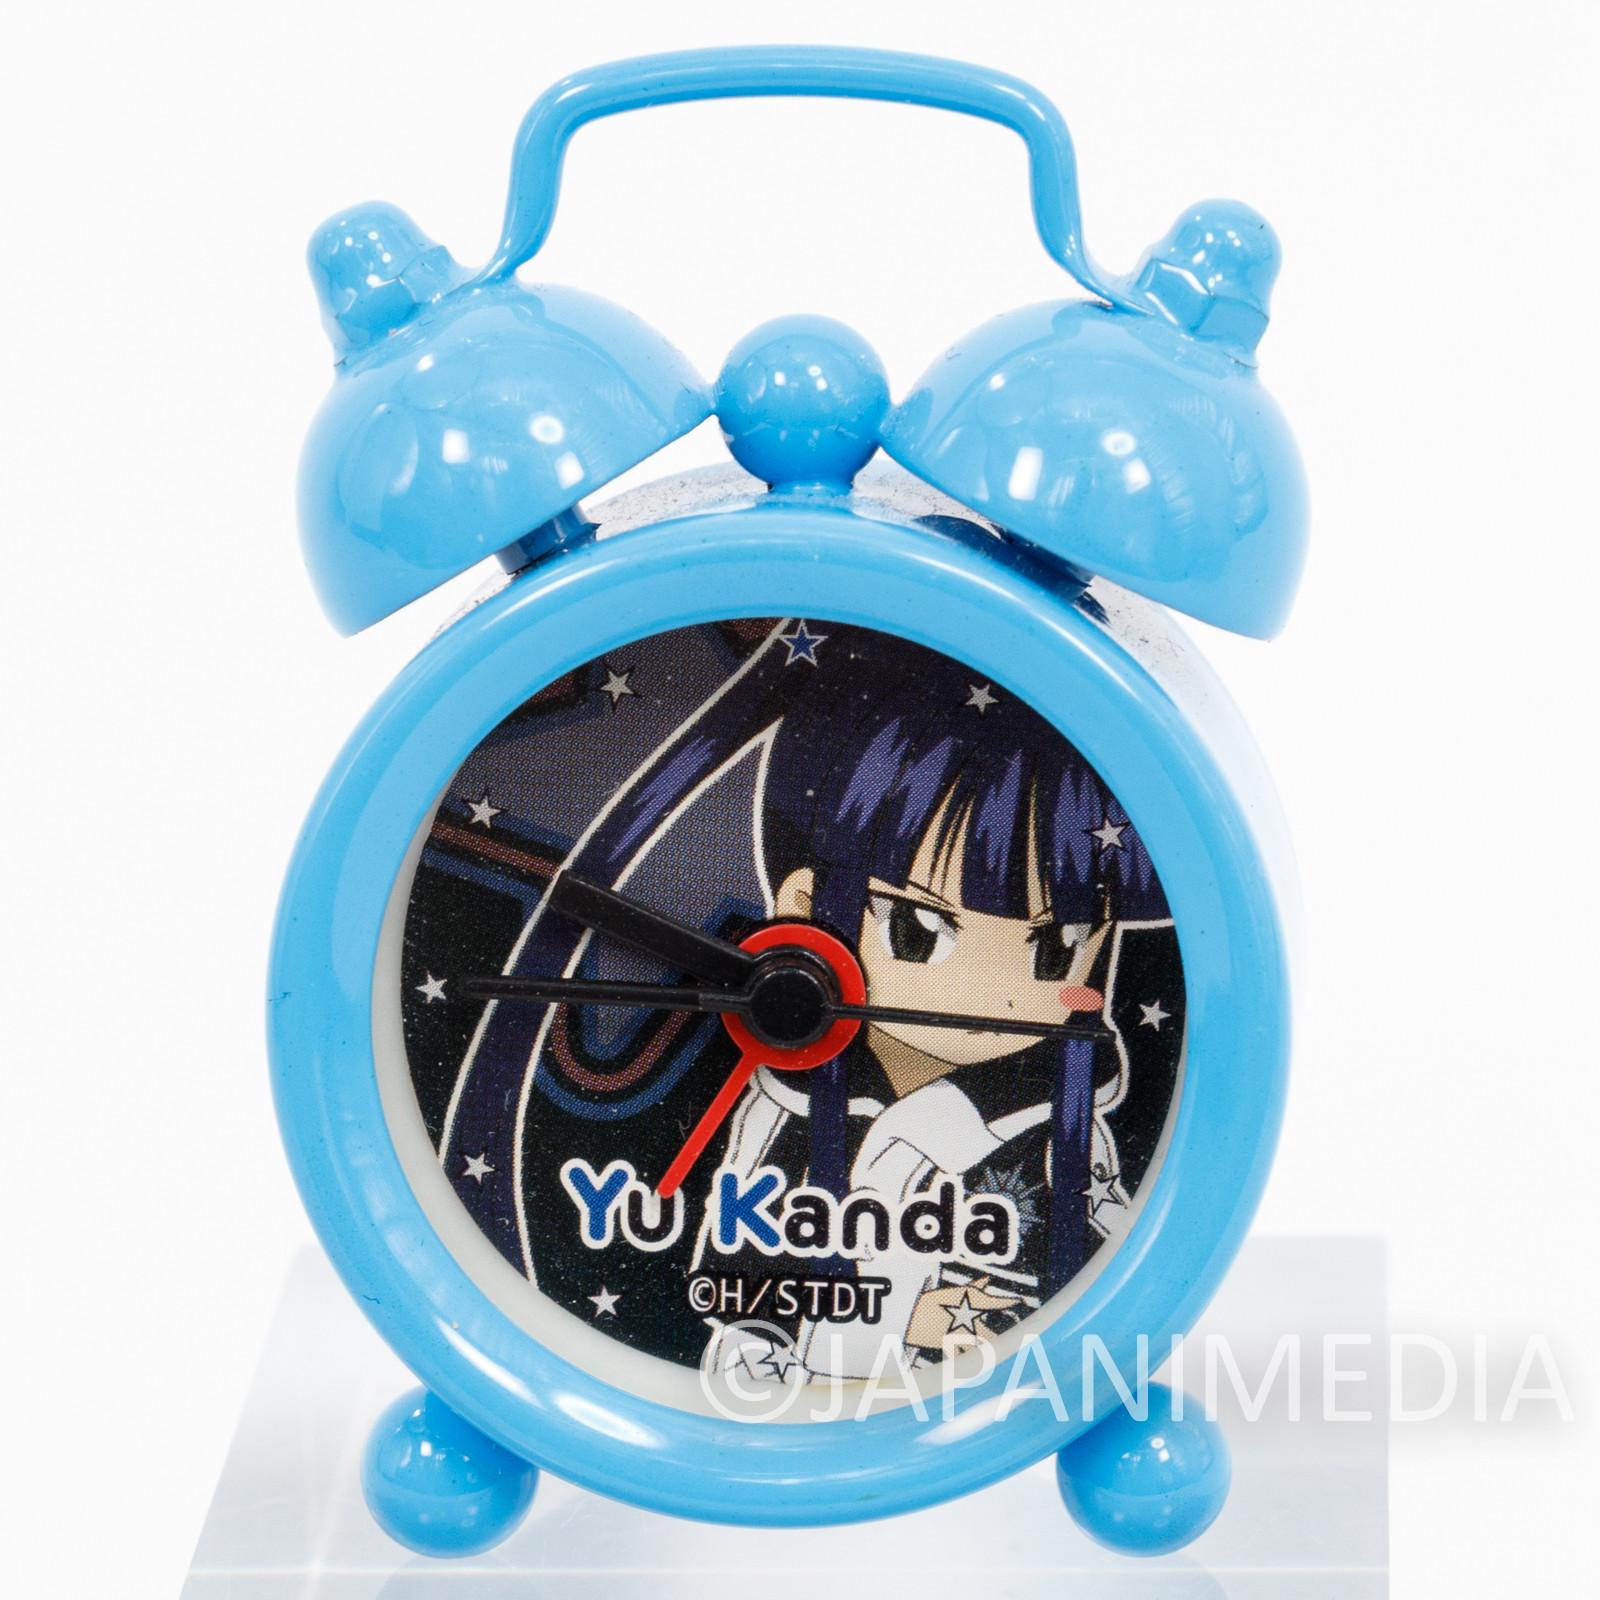 D.Gray-man Yu Kanda Small Alarm Clock Movic JAPAN ANIME